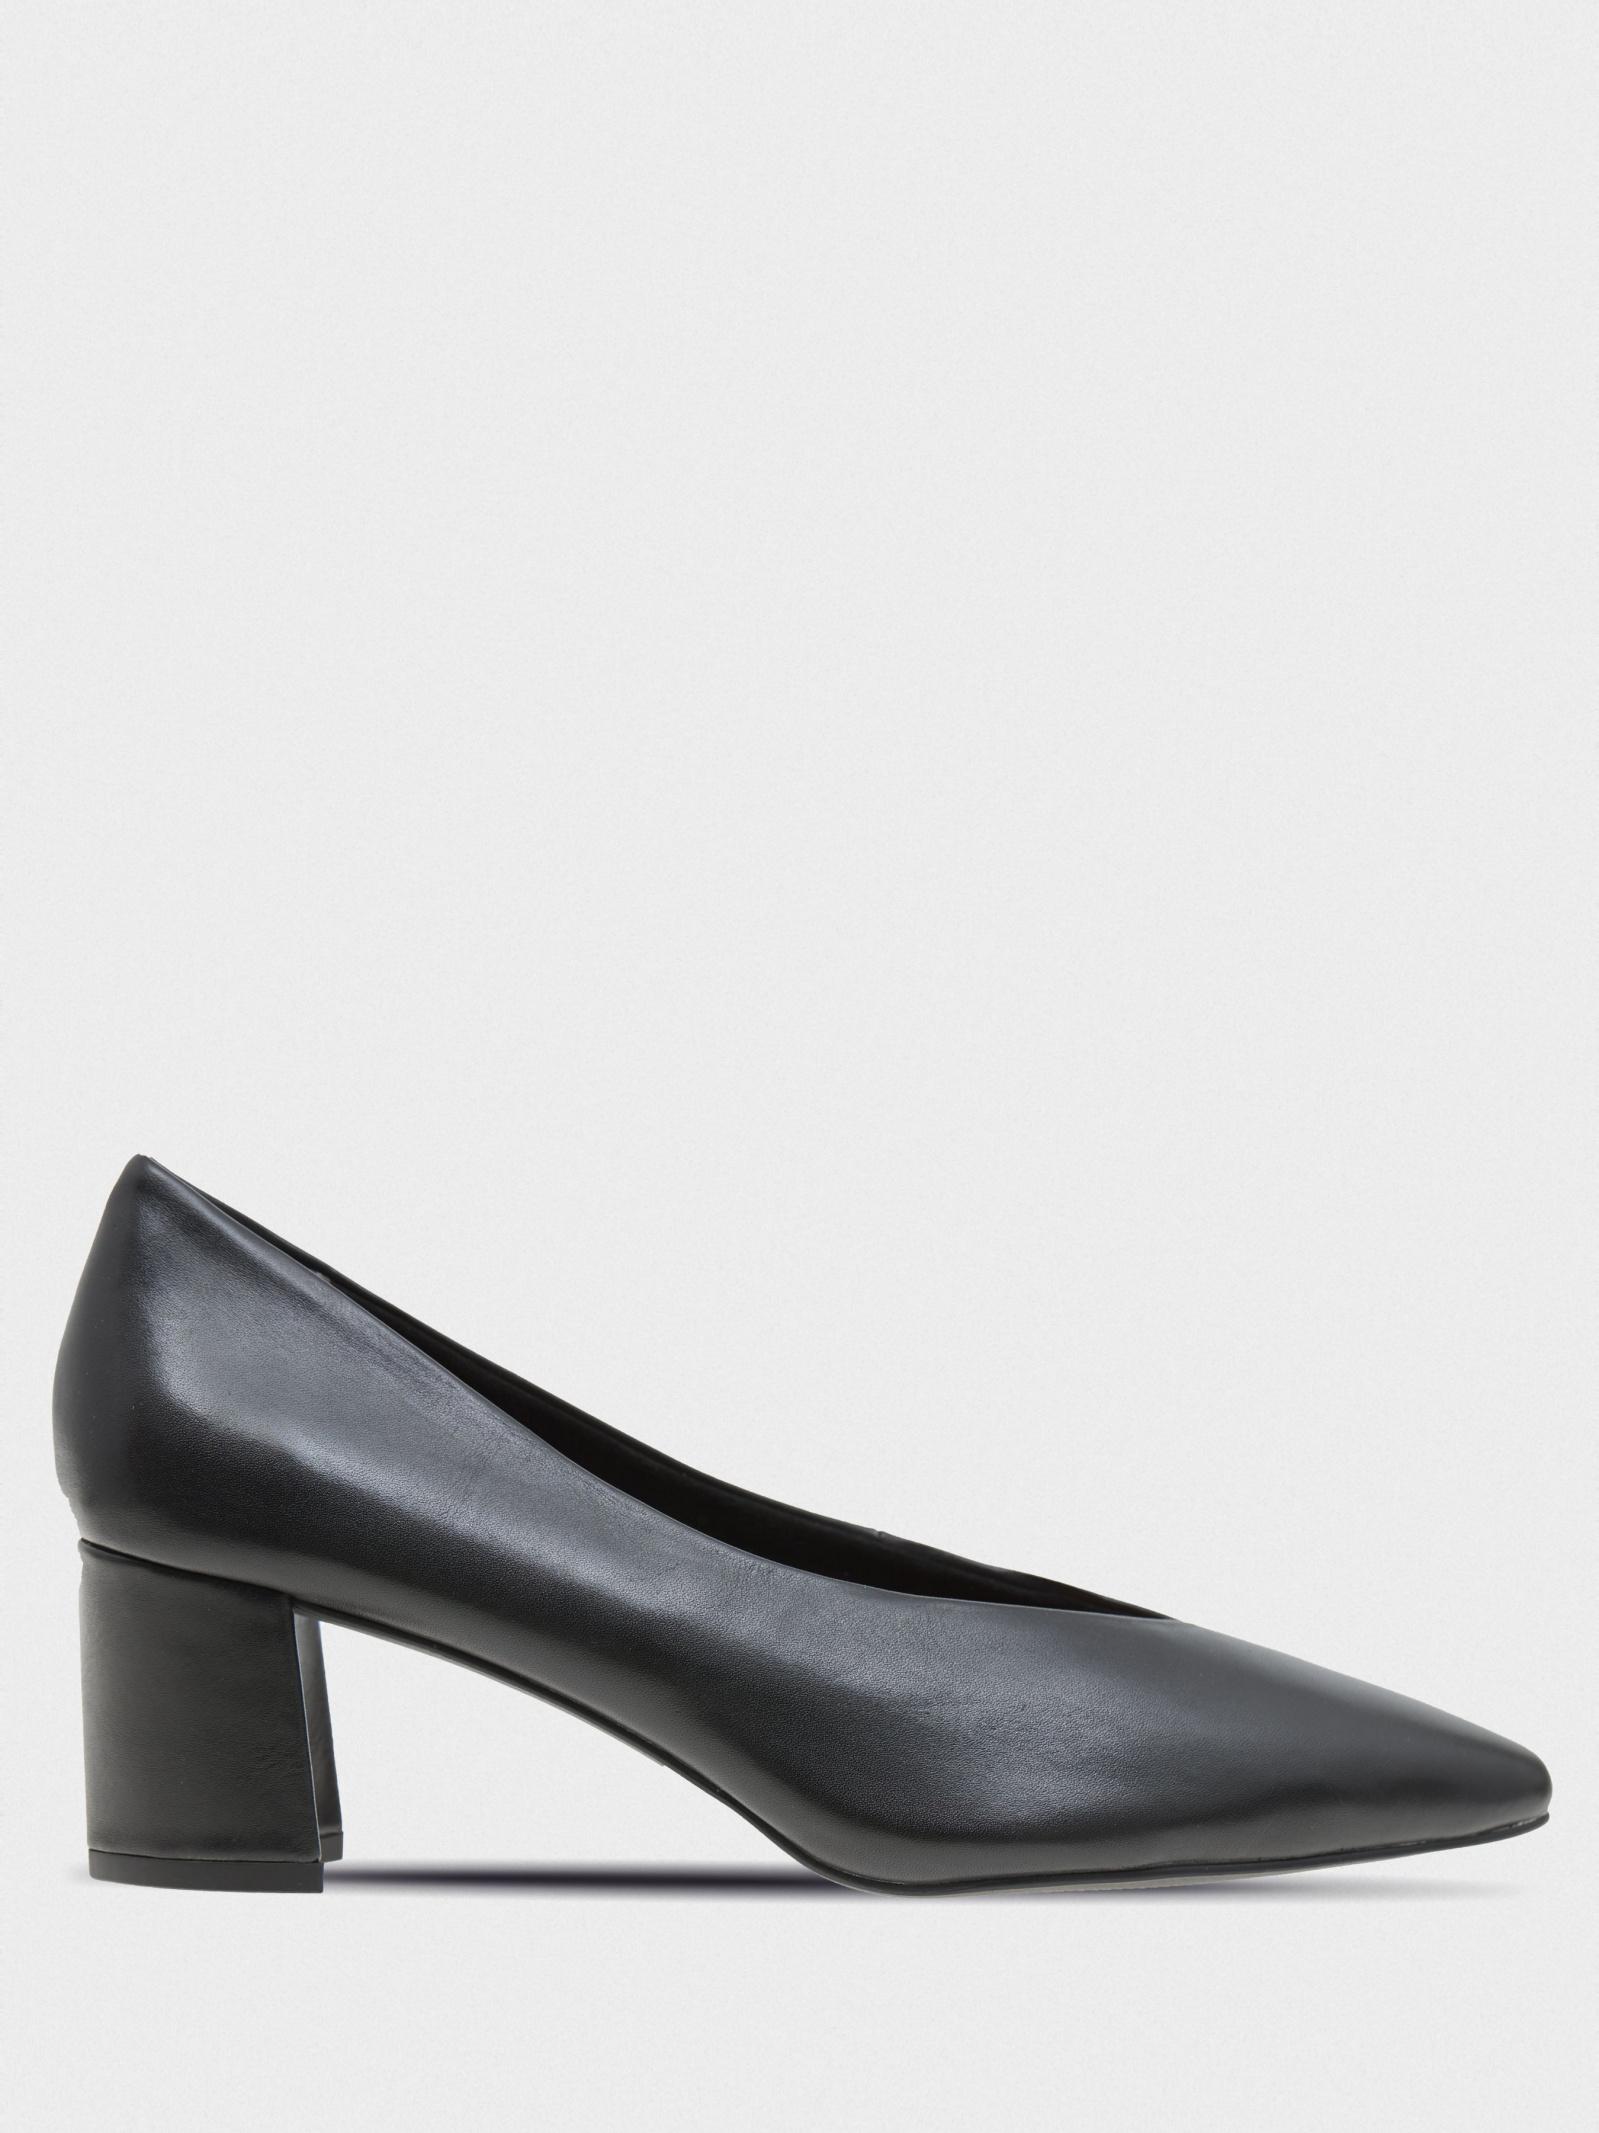 Туфли женские Marco Tozzi 3H310 цена, 2017